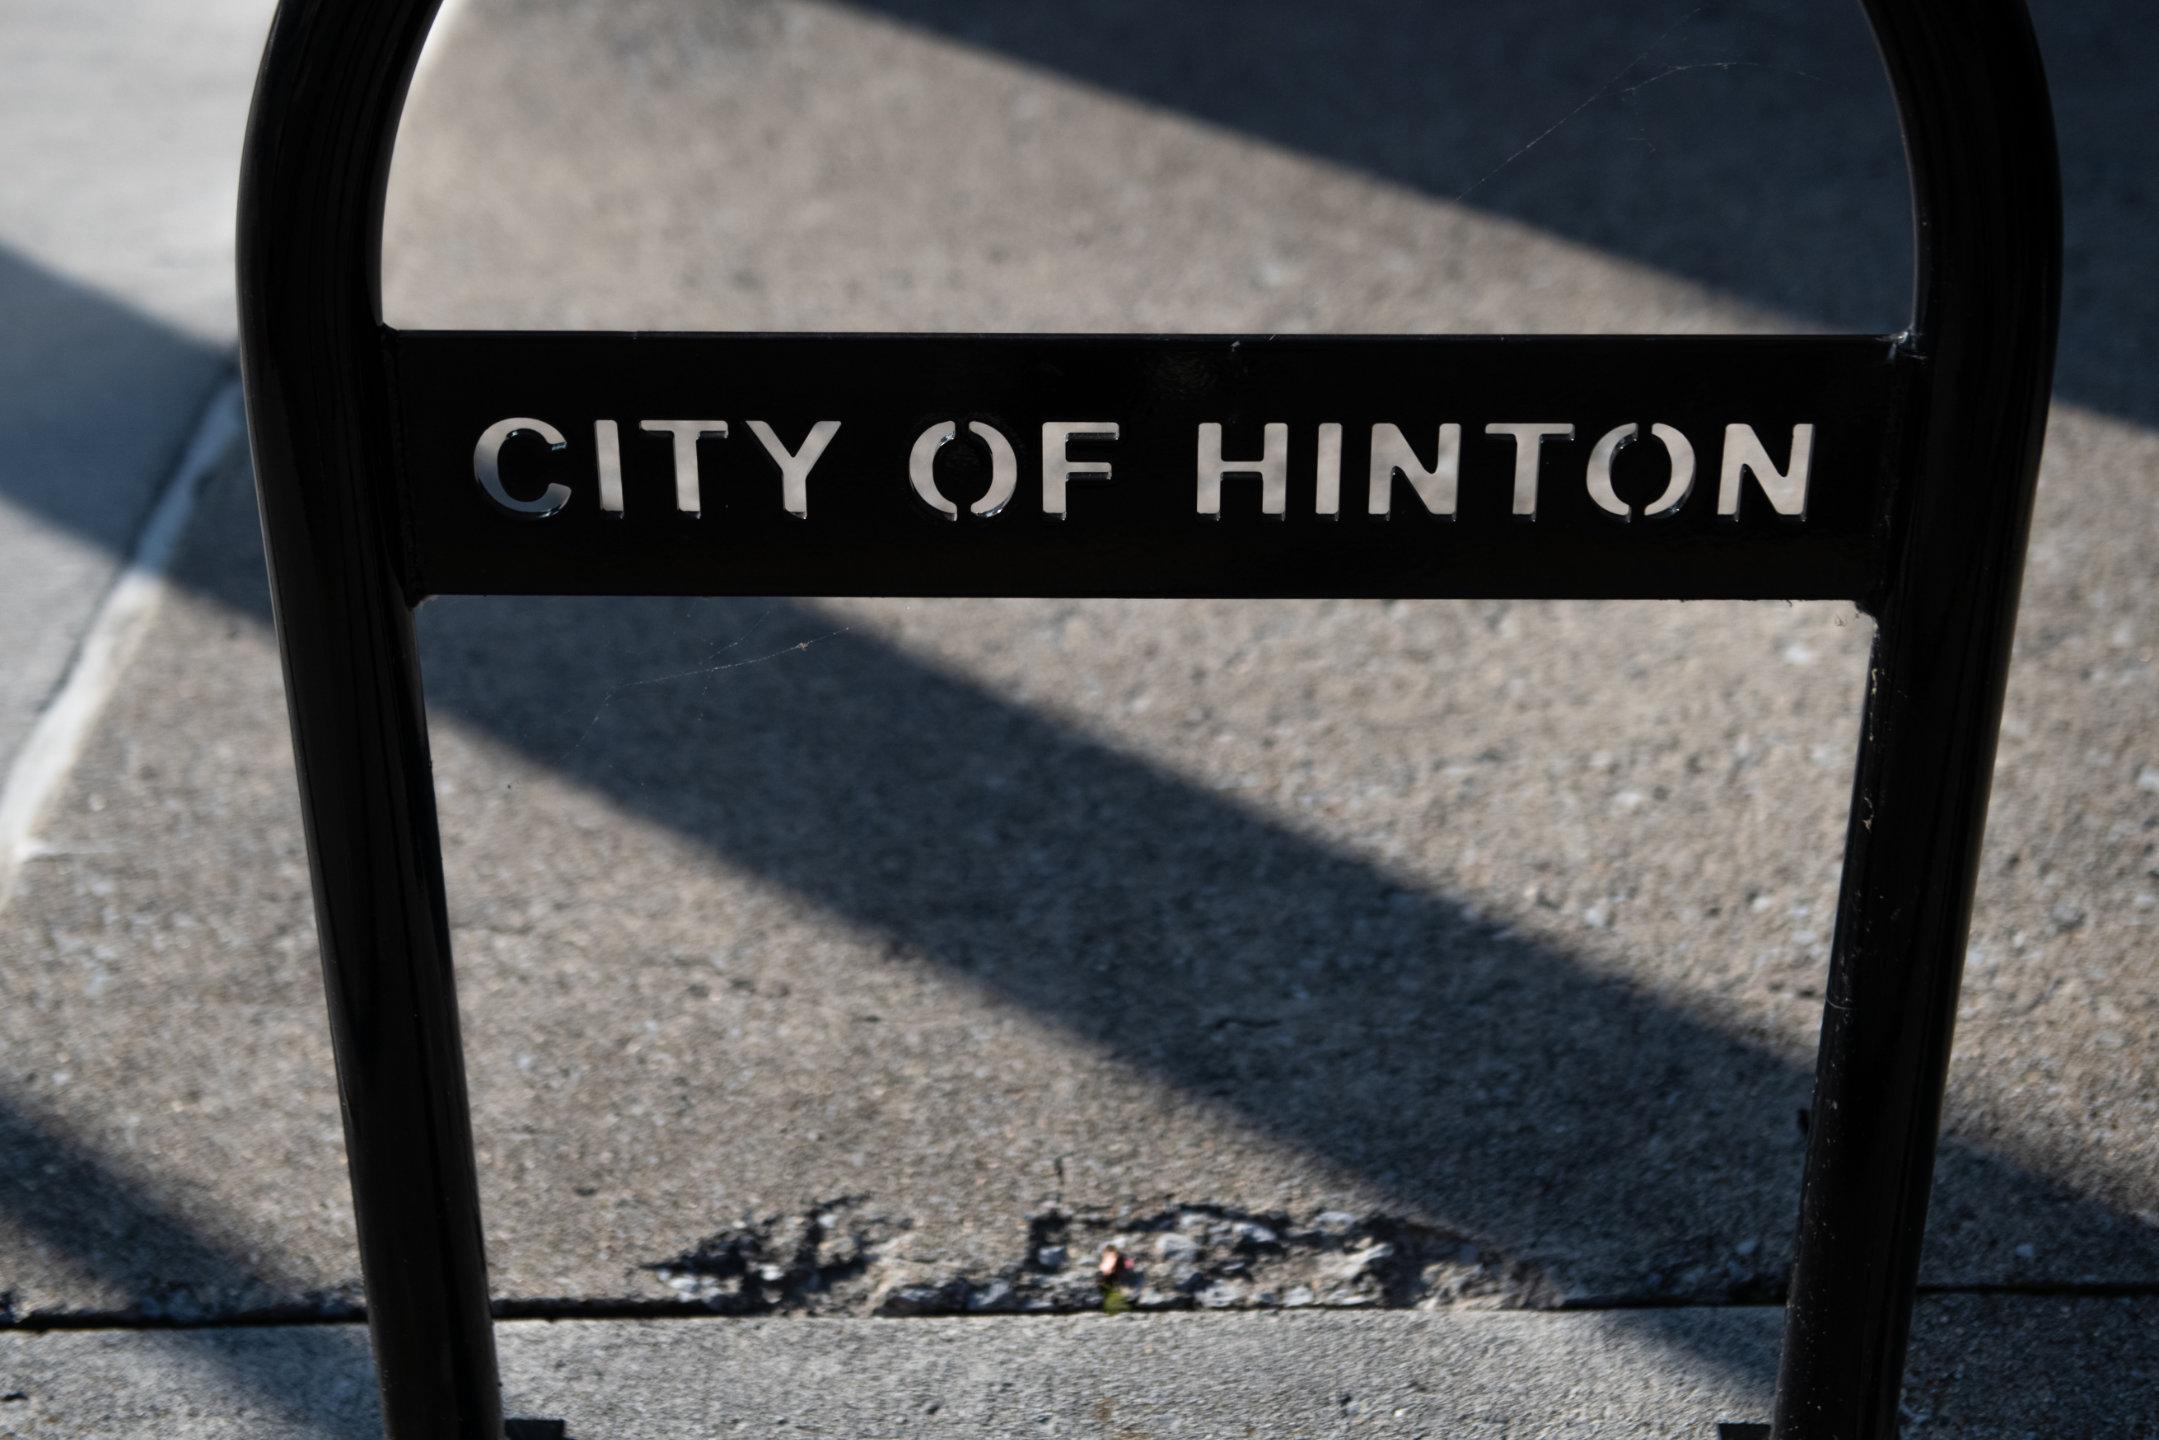 061221_Hub_Hinton_87